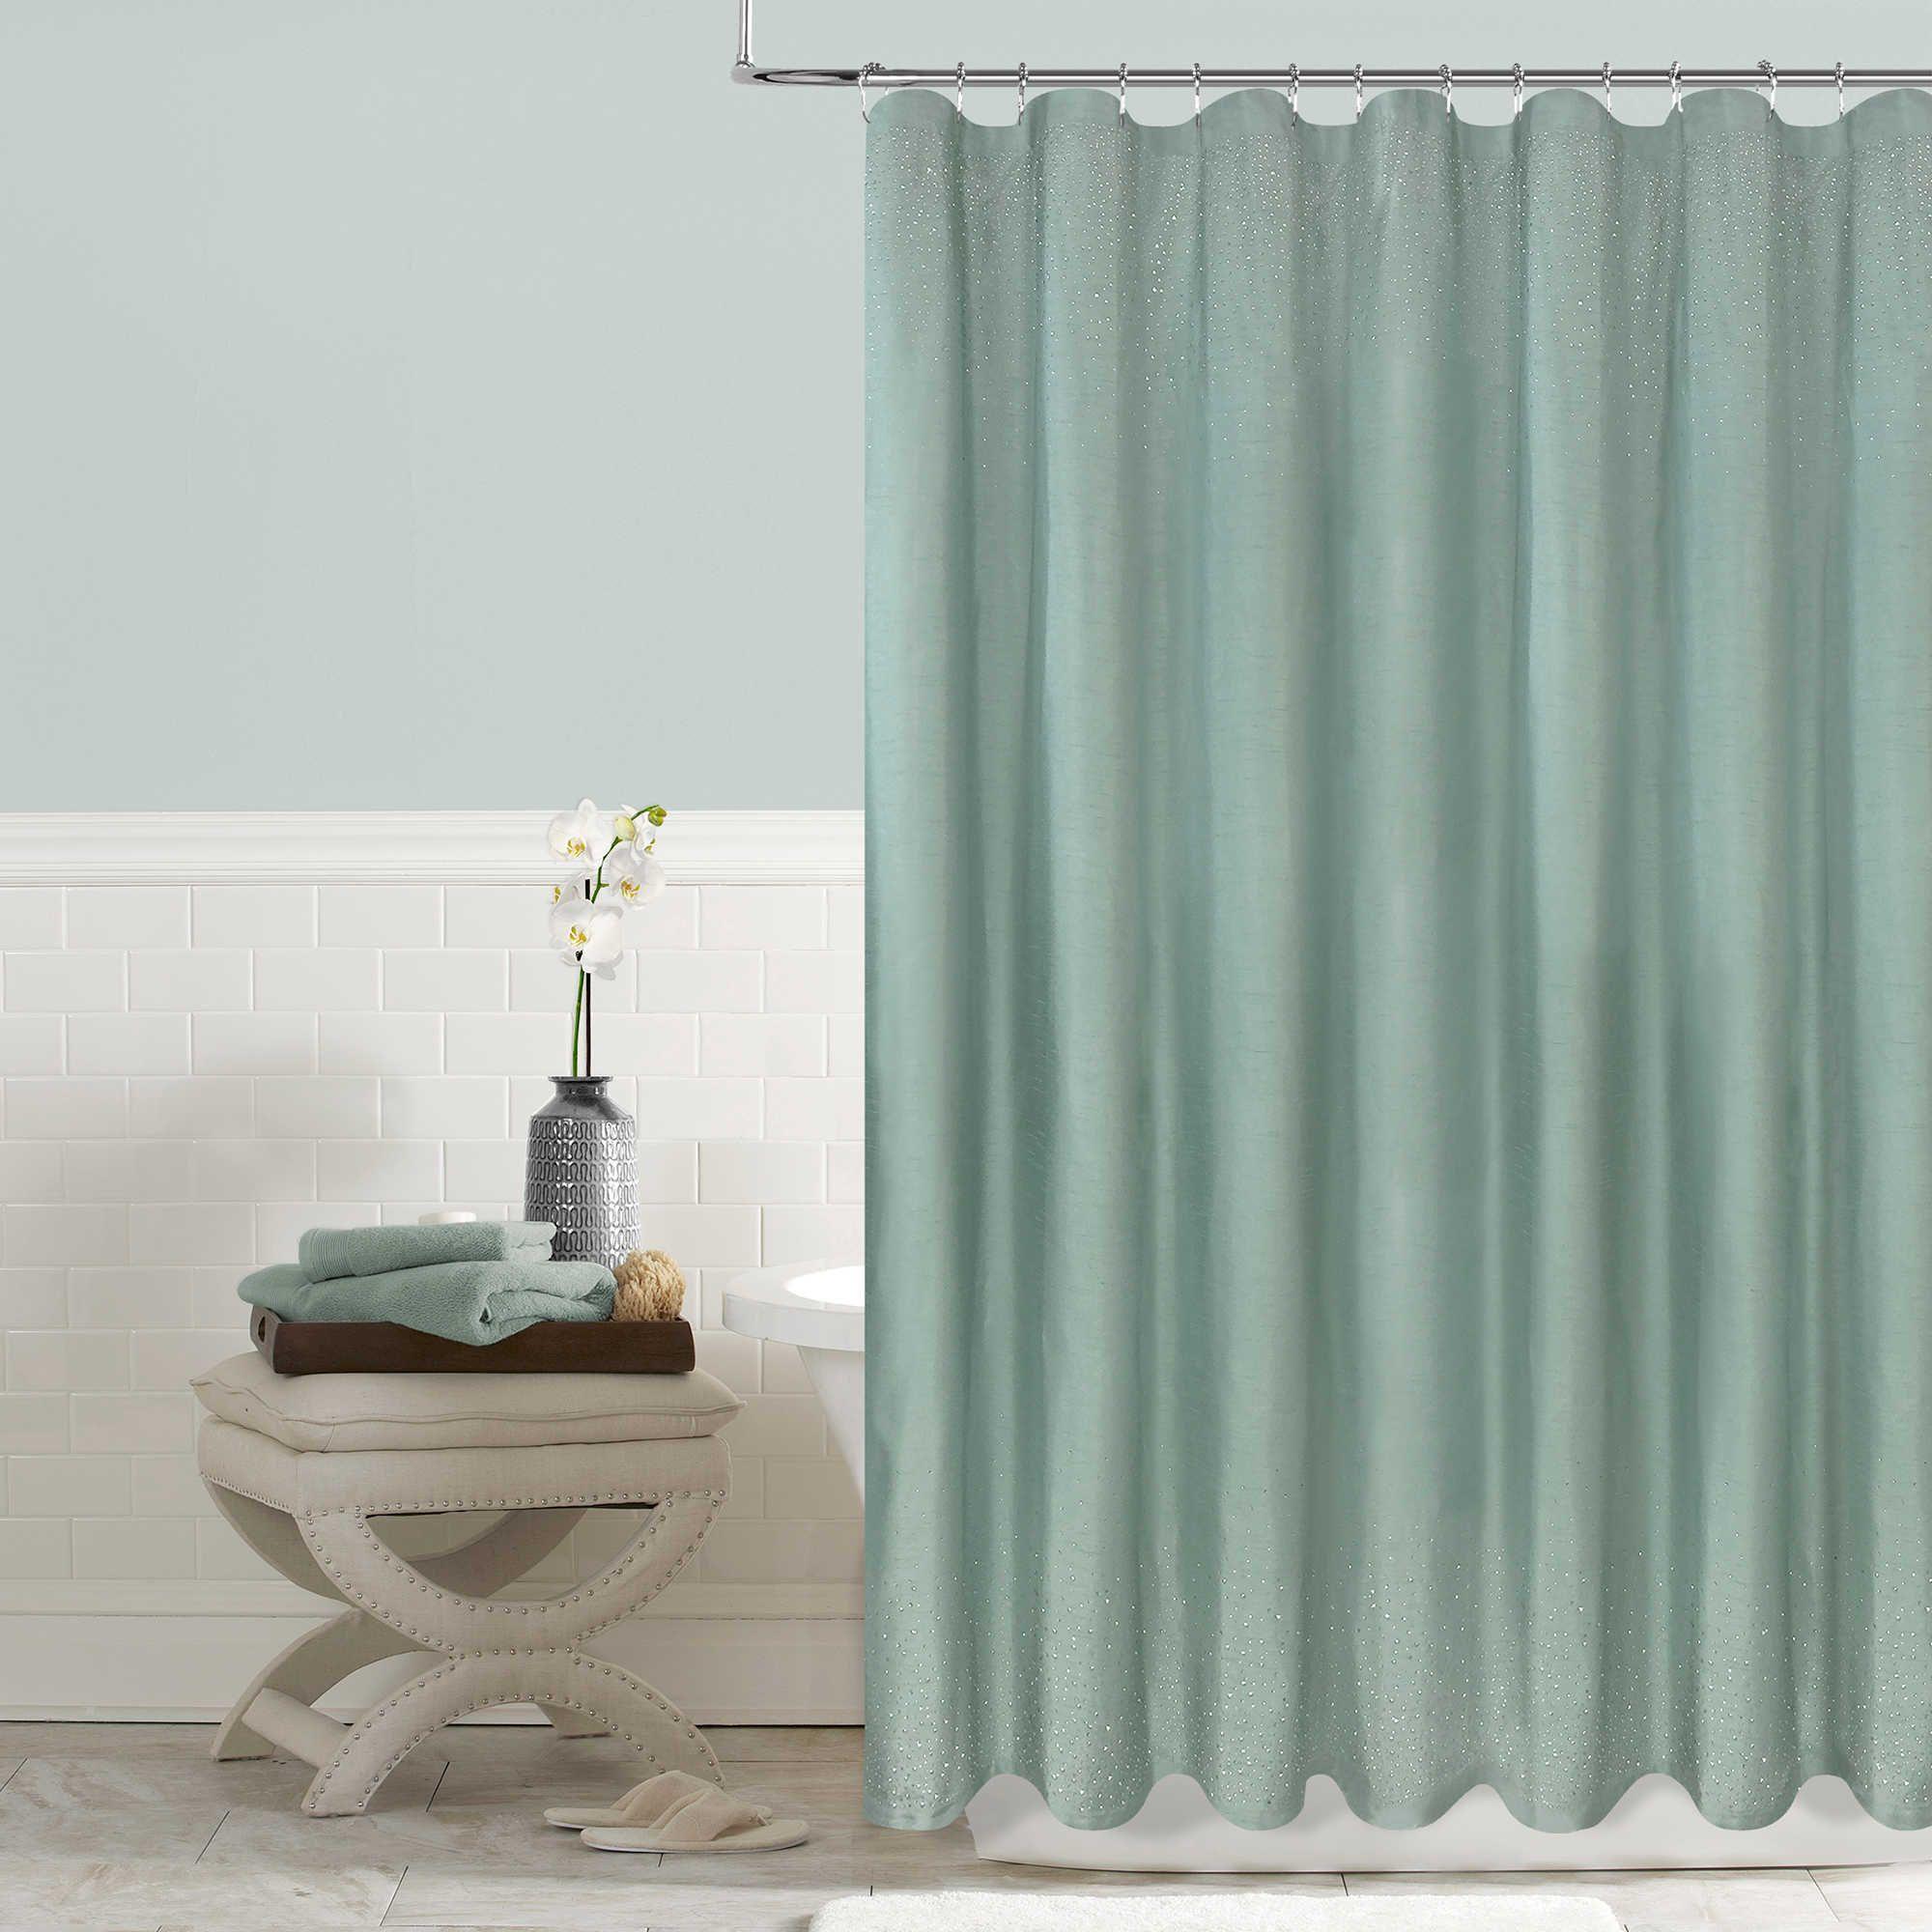 Twilight 72 Inch X 96 Shower Curtain In Aqua